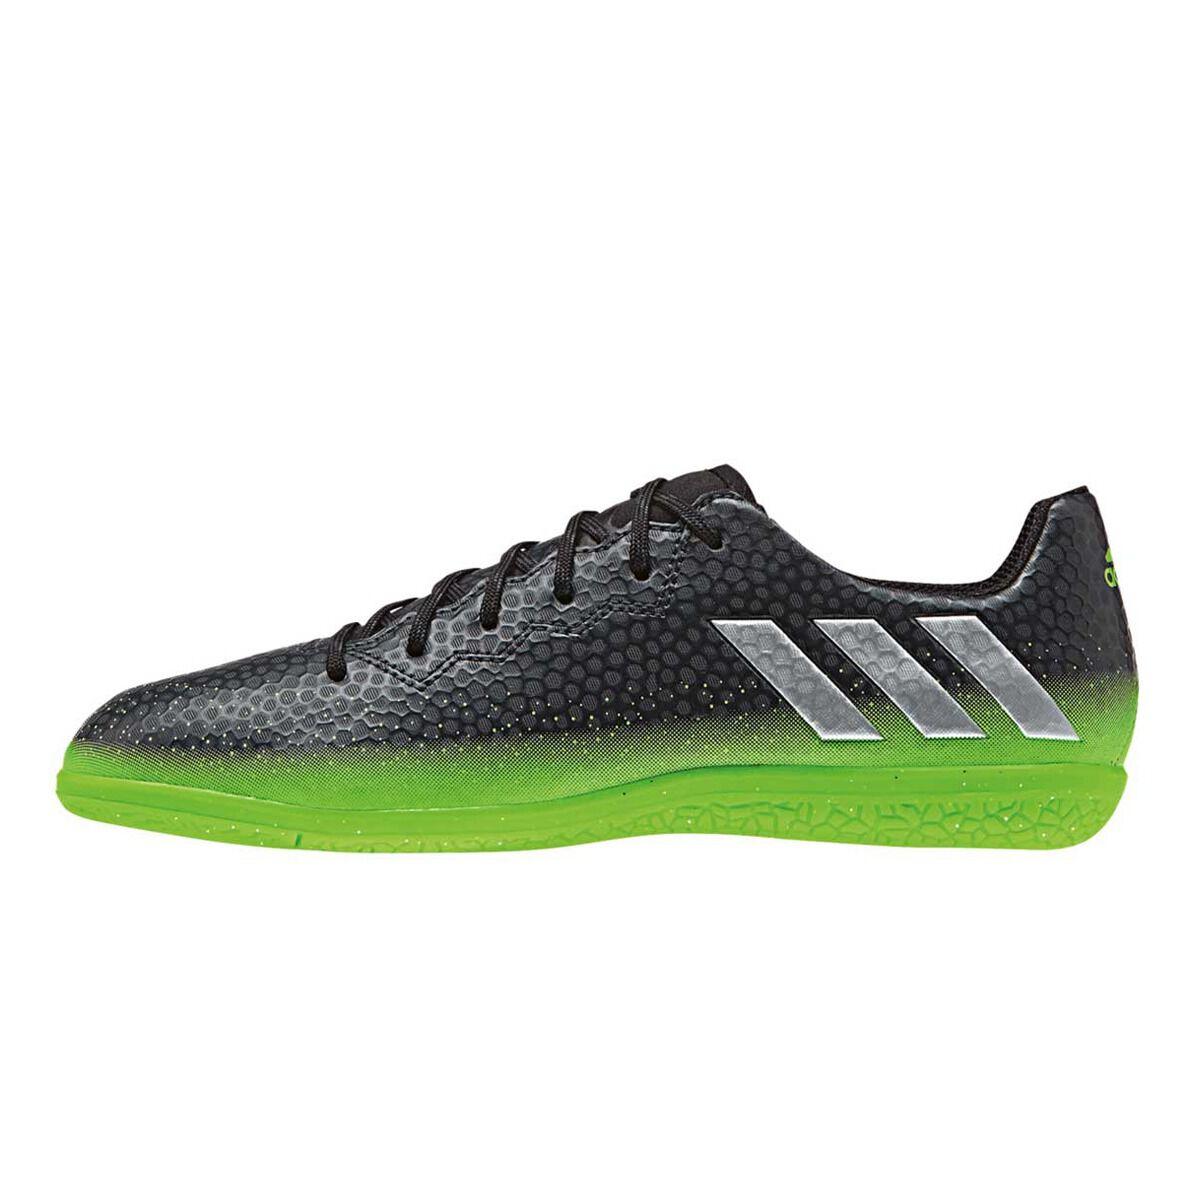 adidas football indoor shoes  df8ff3d42a4